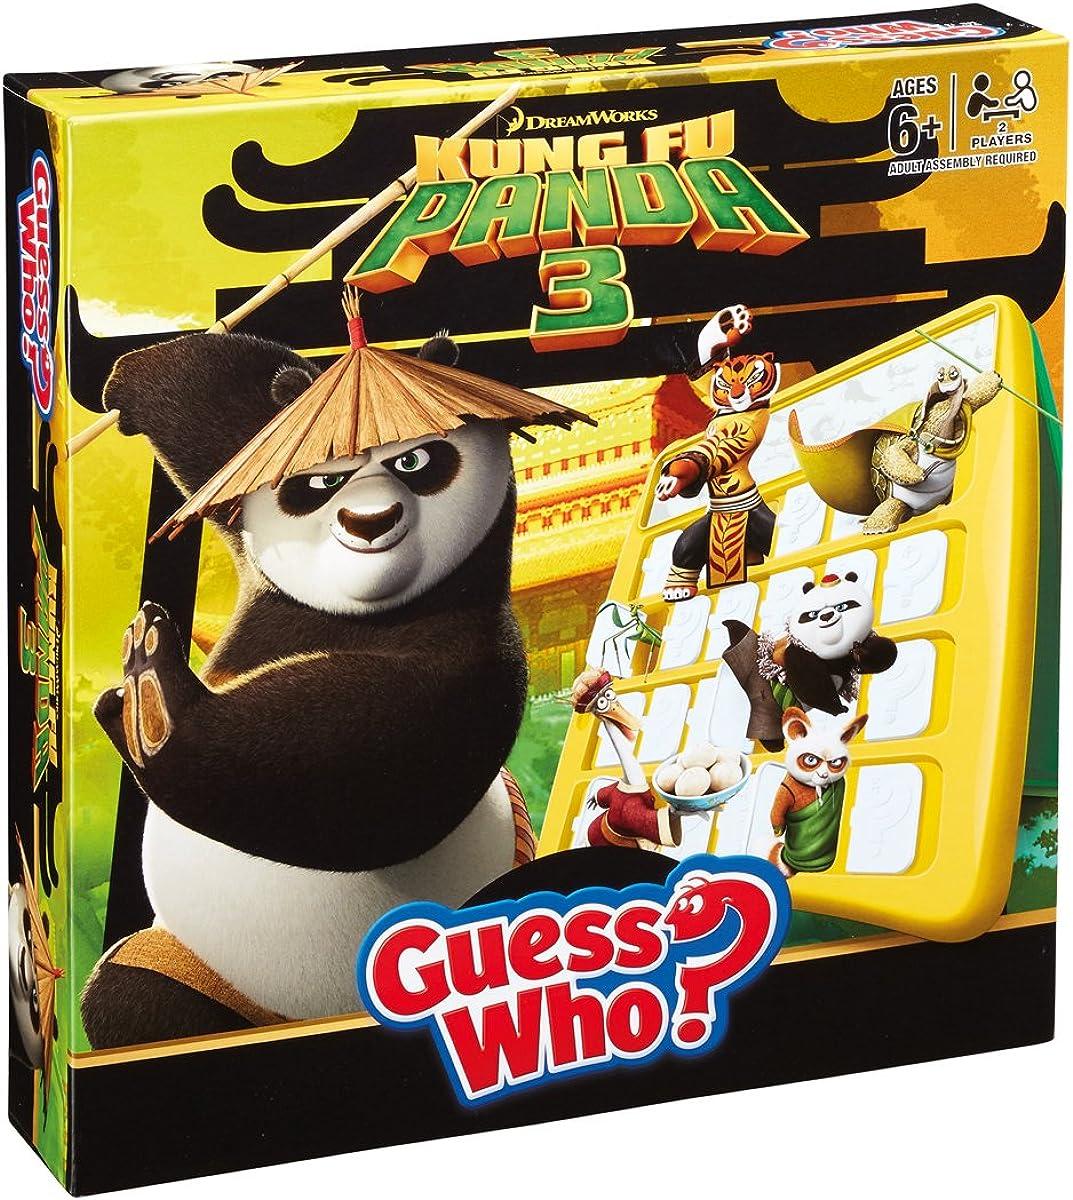 Kung Fu Panda édition 3 GUESS WHO